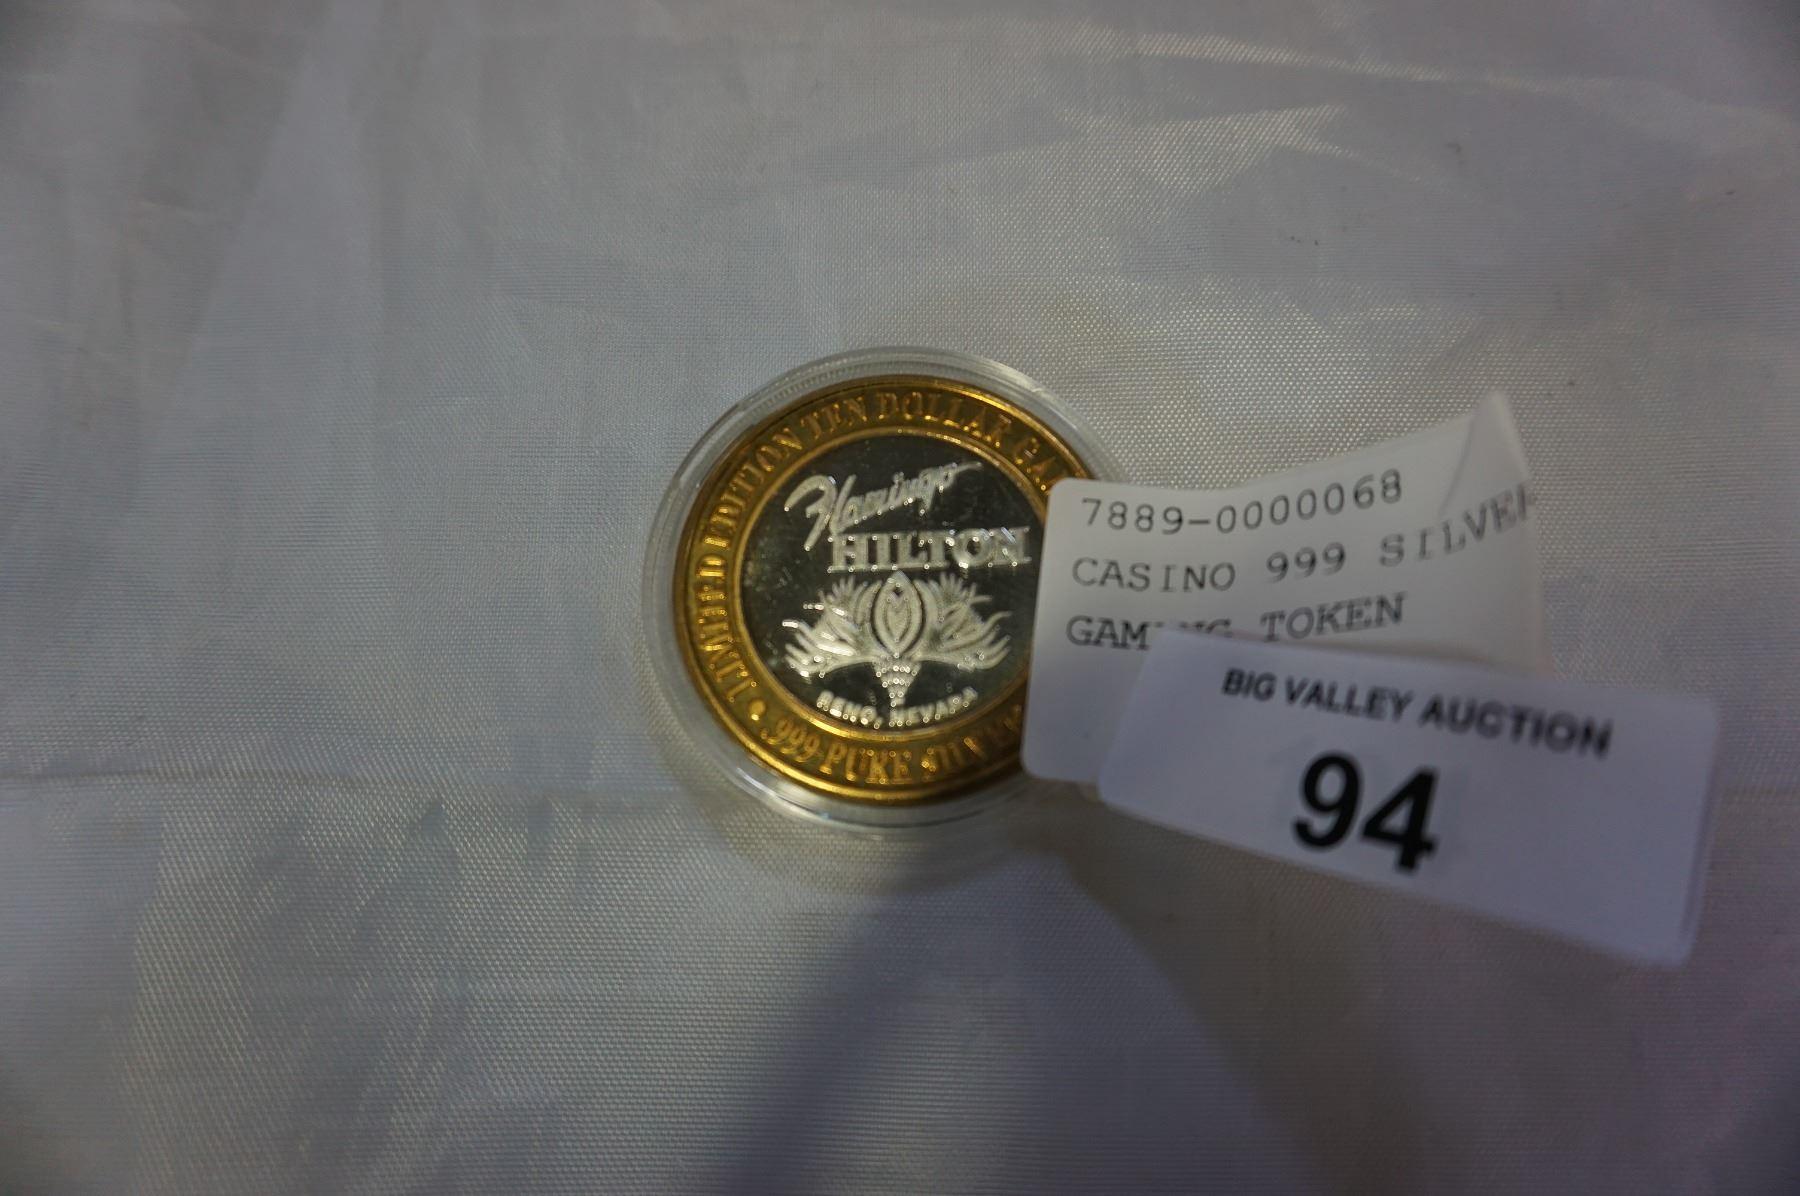 CASINO 999 SILVER 10 DOLLAR GAMING TOKEN - Big Valley Auction